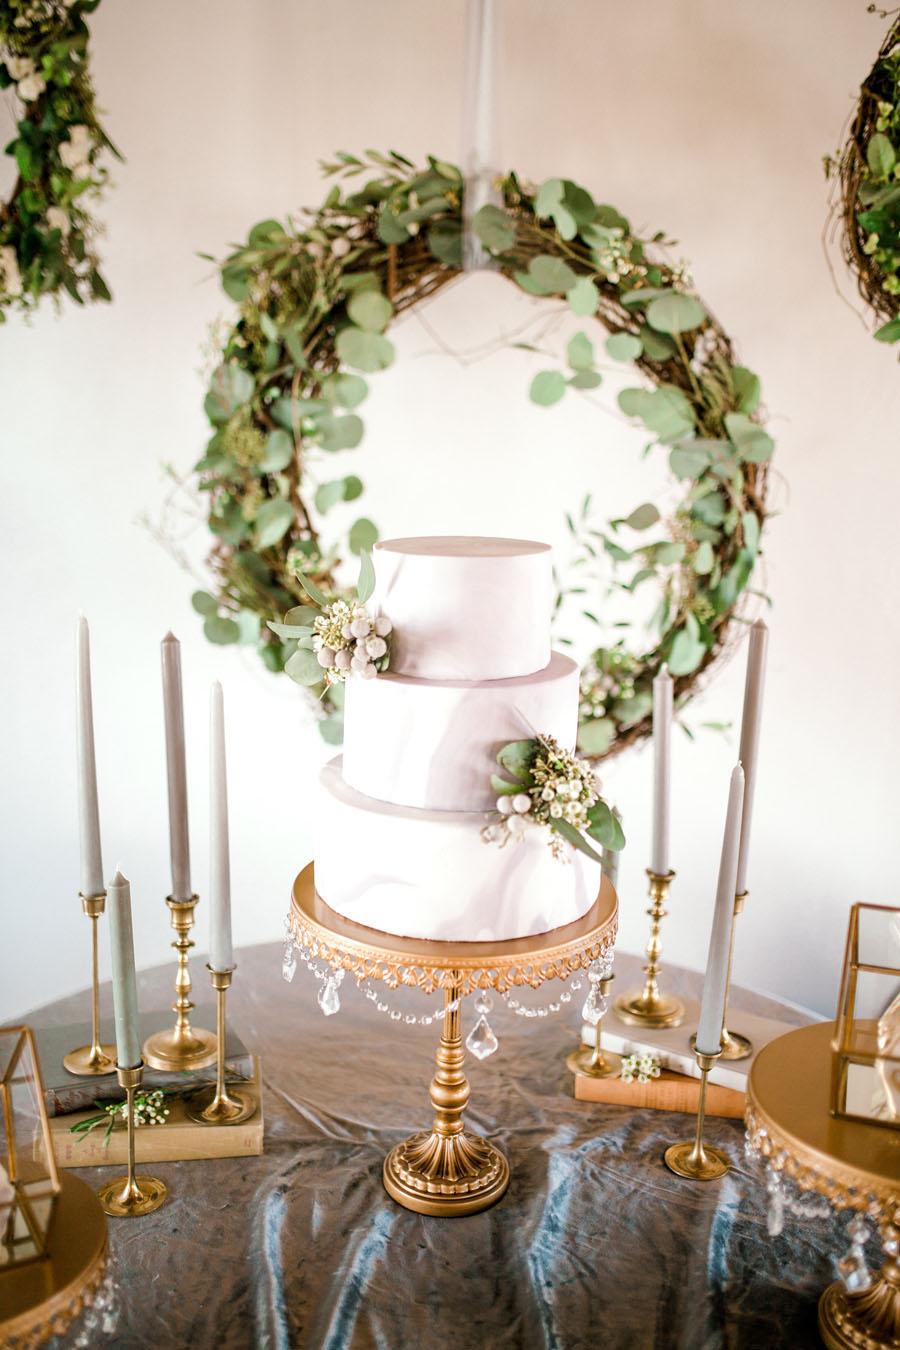 Grey-and-greenery-wedding-cake-table-2.jpg